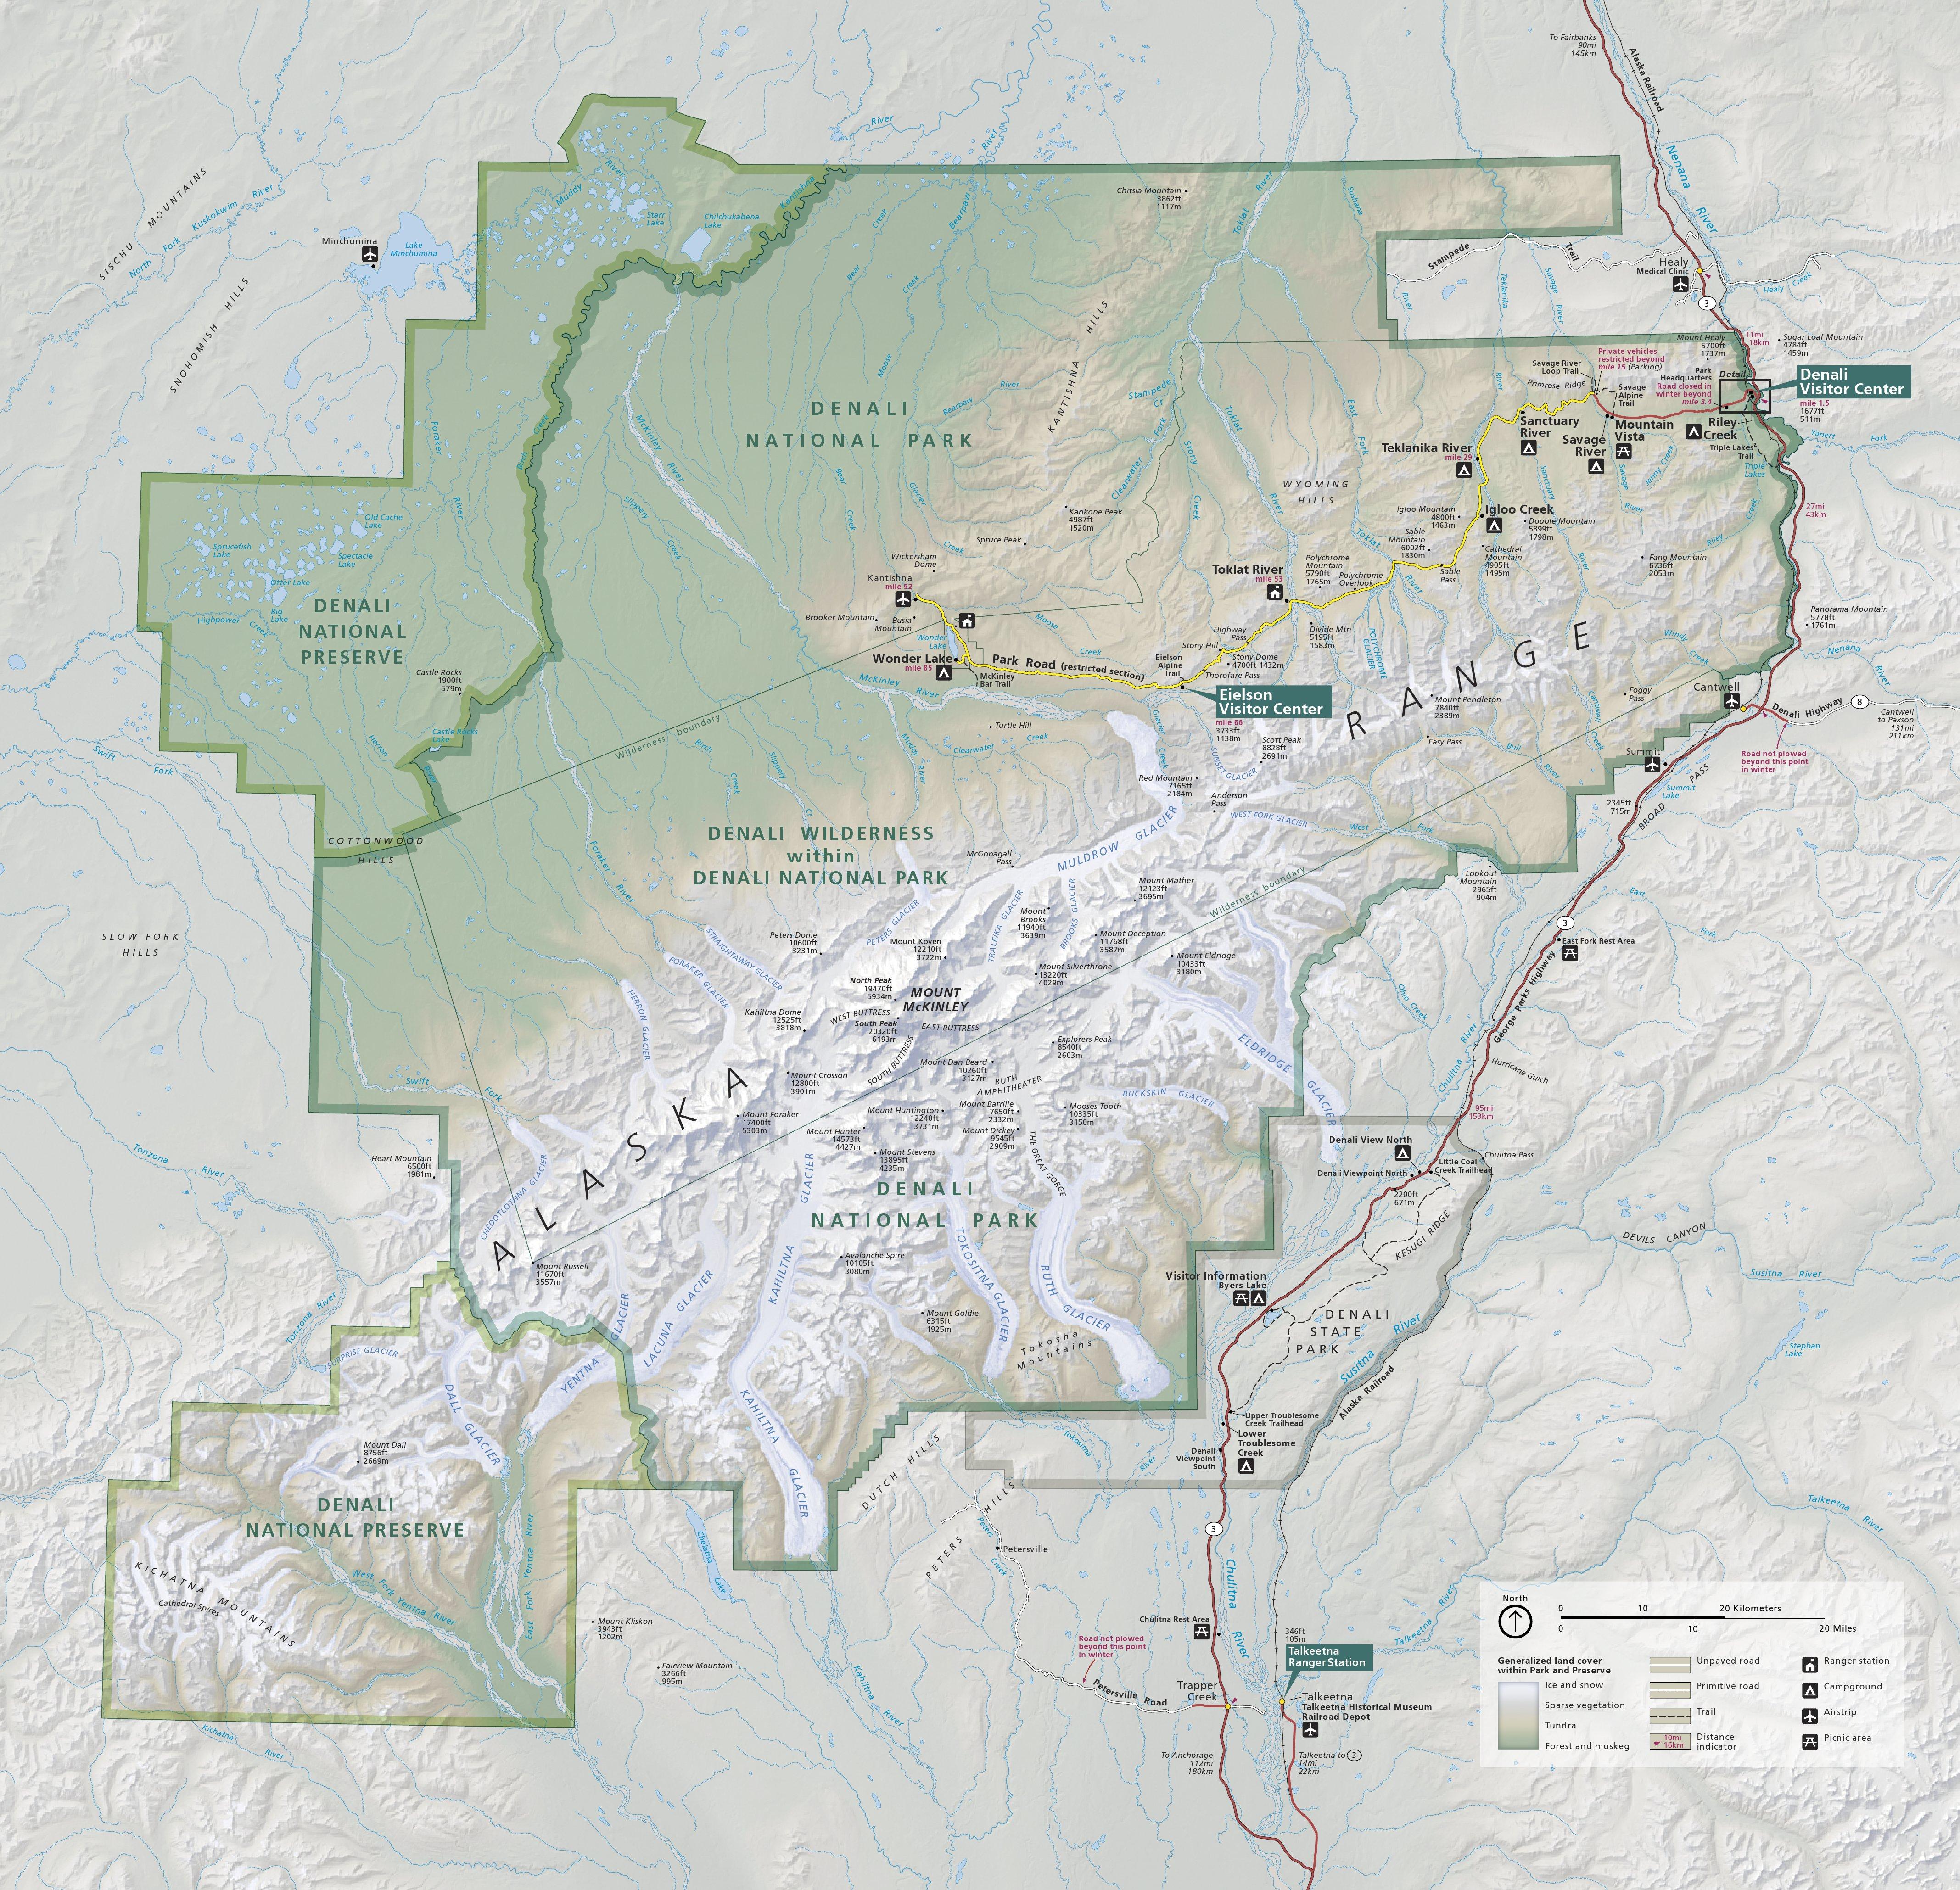 denali-map